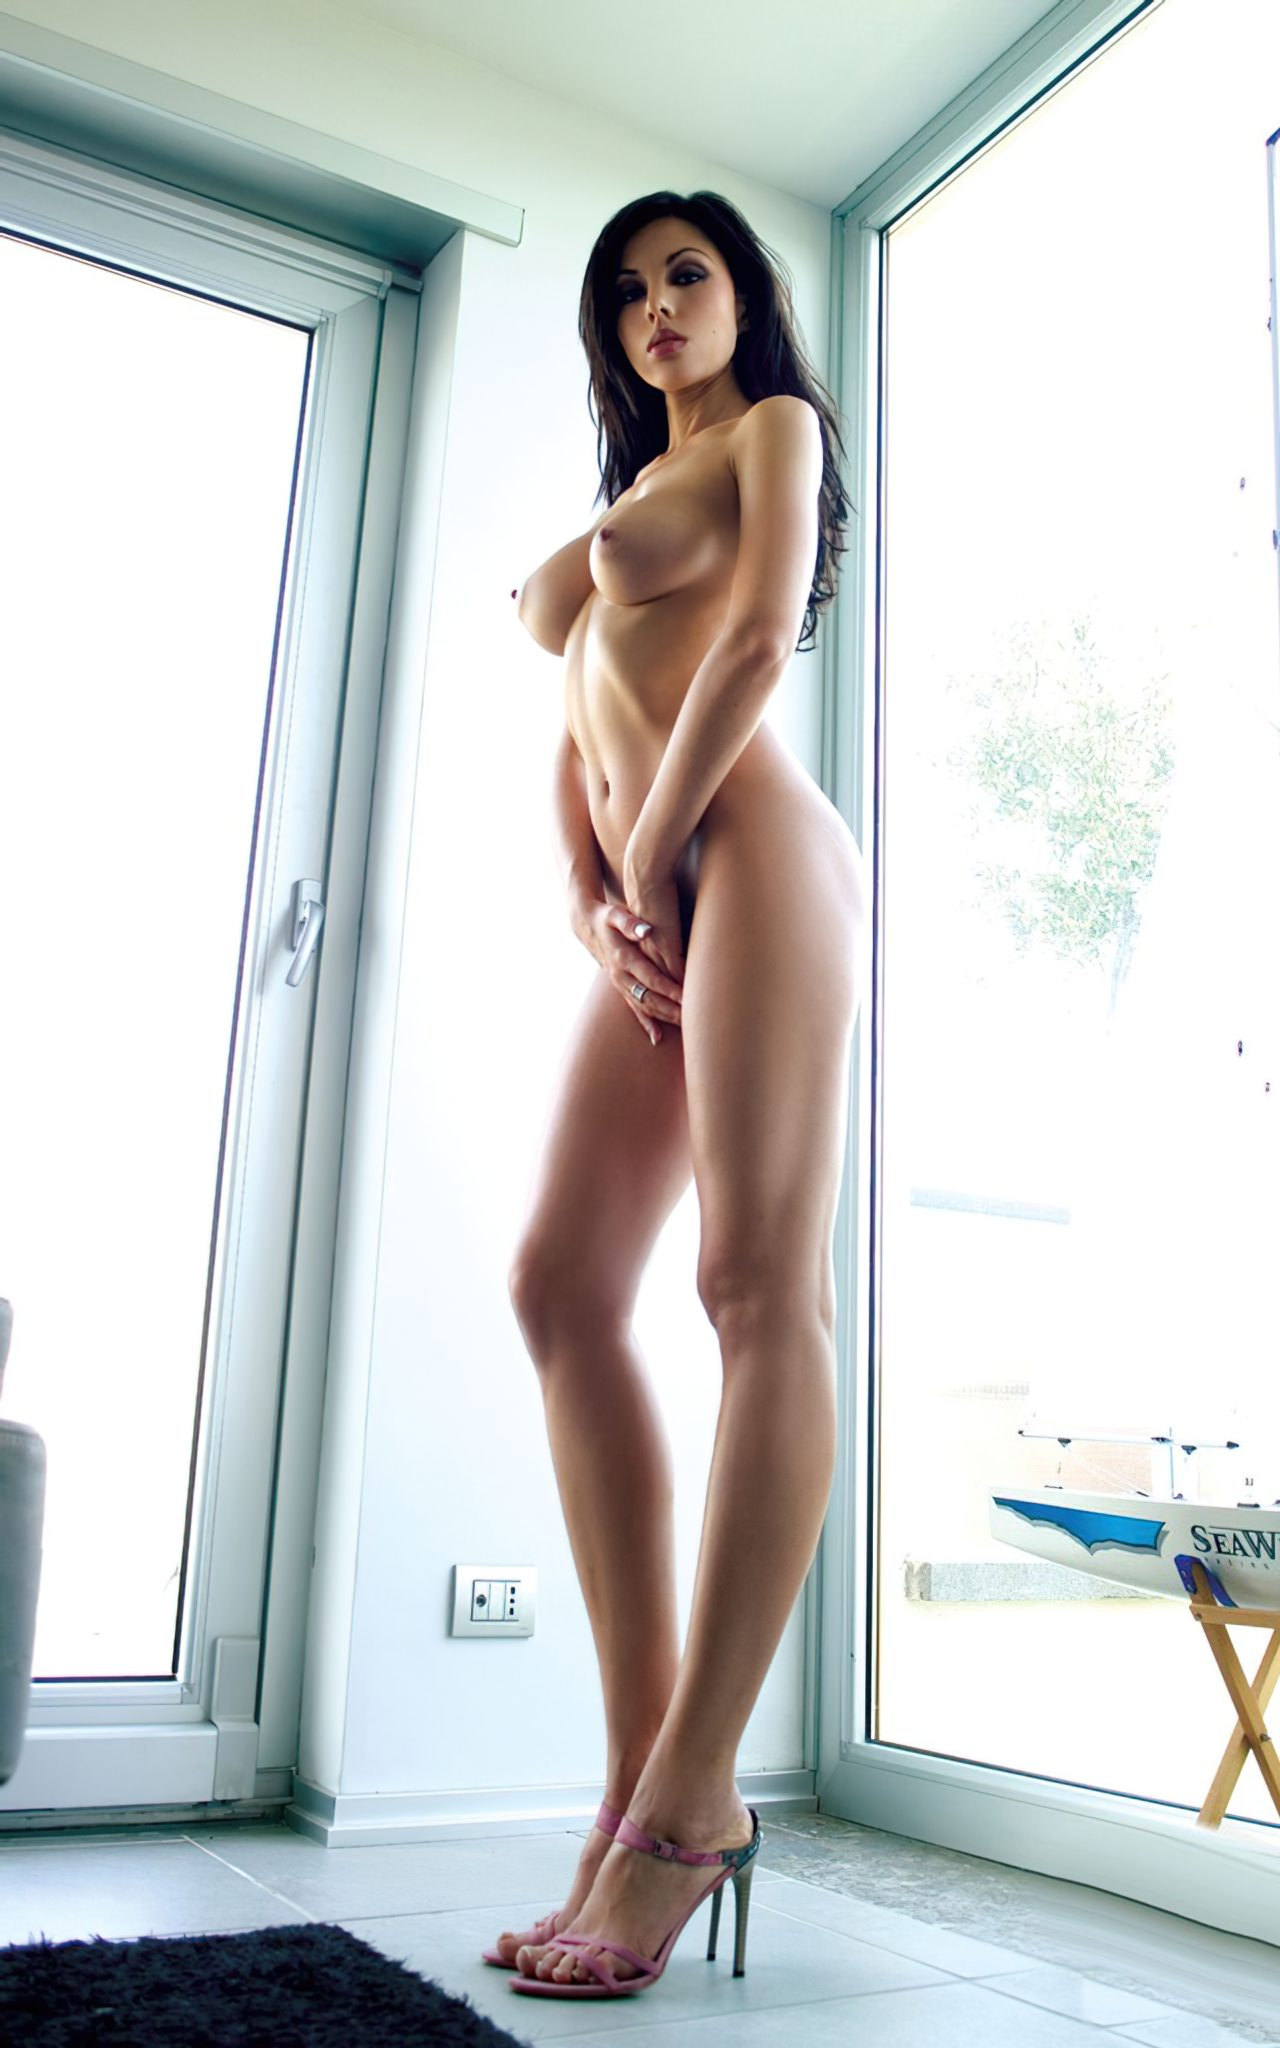 Fotos de Mulheres Nuas (42)